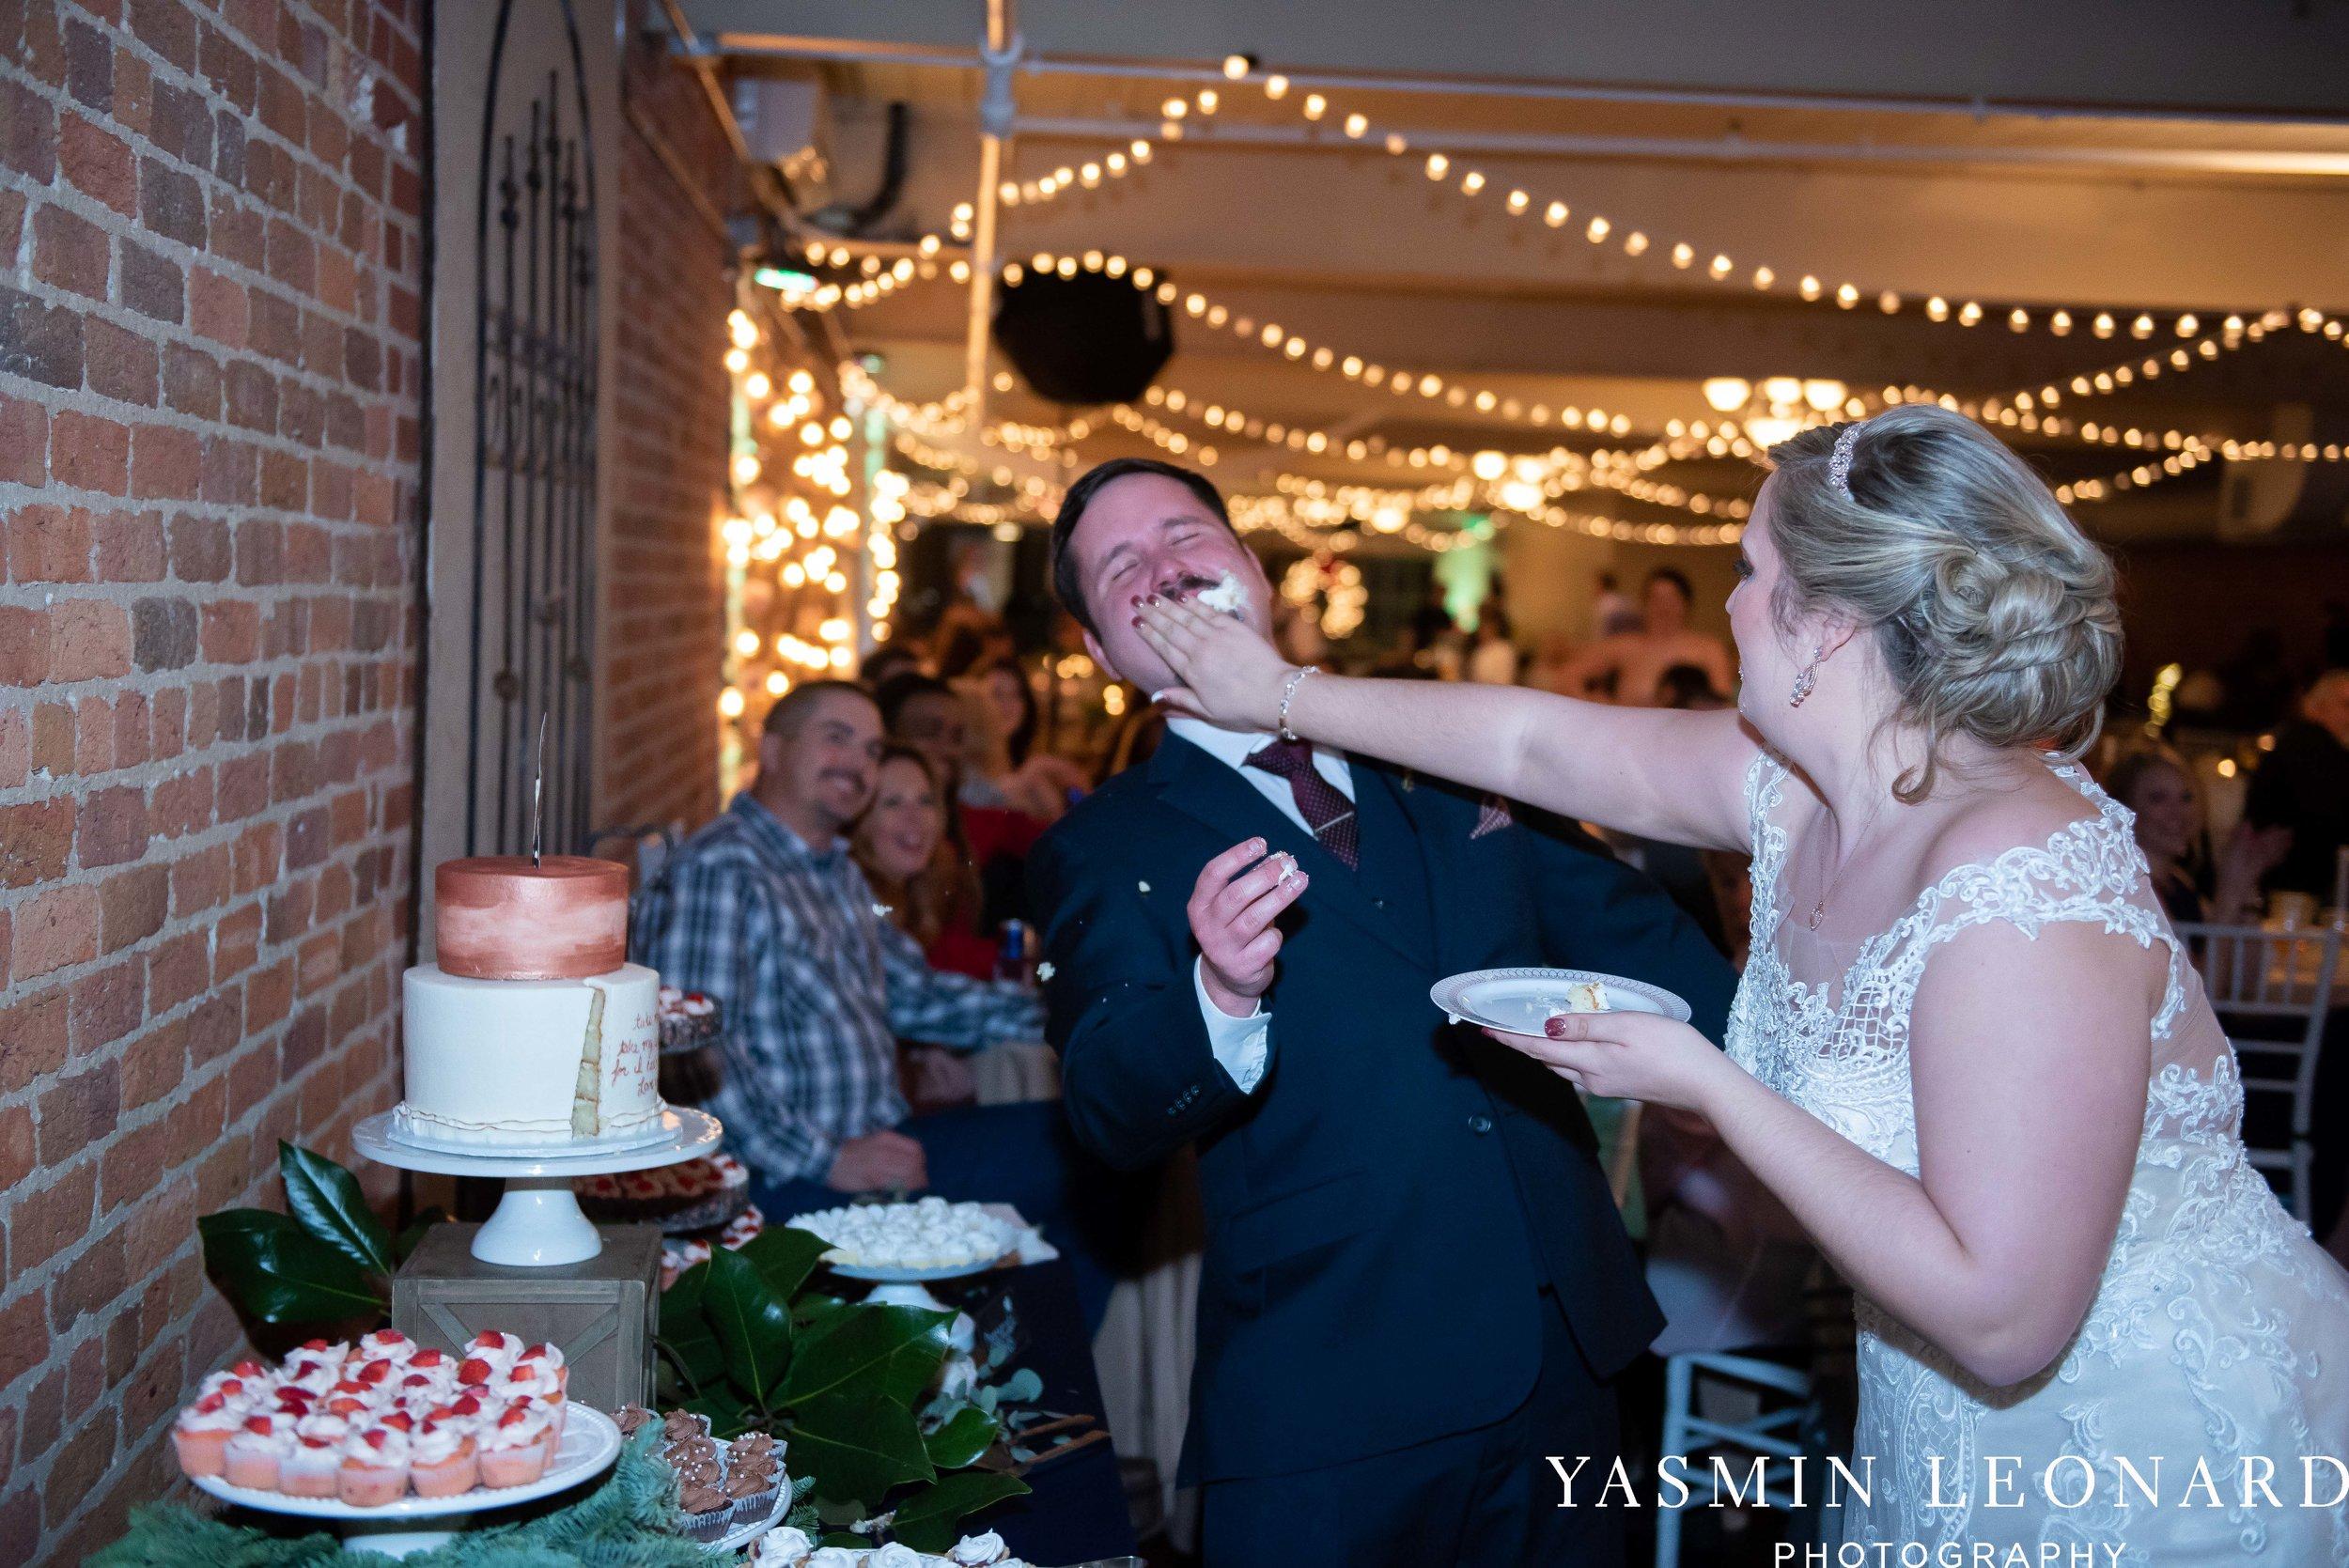 Rebekah and Matt - 105 Worth Event Centre - Yasmin Leonard Photography - Asheboro Wedding - NC Wedding - High Point Weddings - Triad Weddings - Winter Wedding-59.jpg